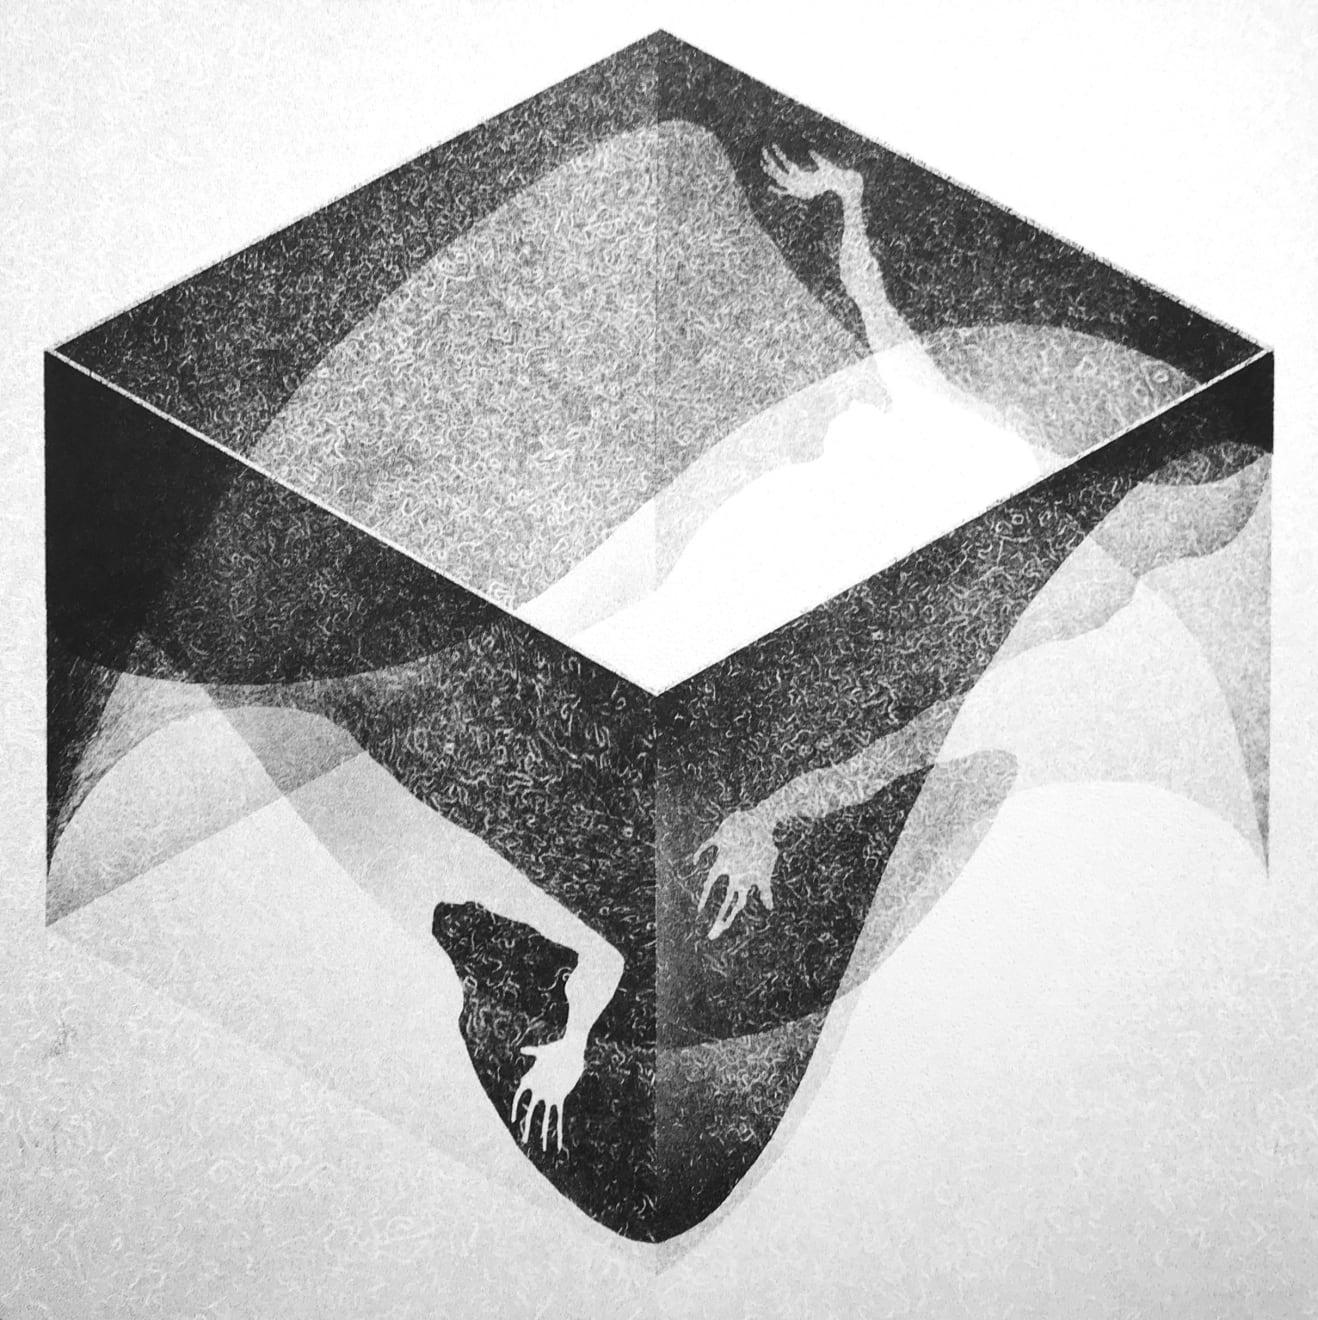 Veta Gorner, Shape of Nature, 2020